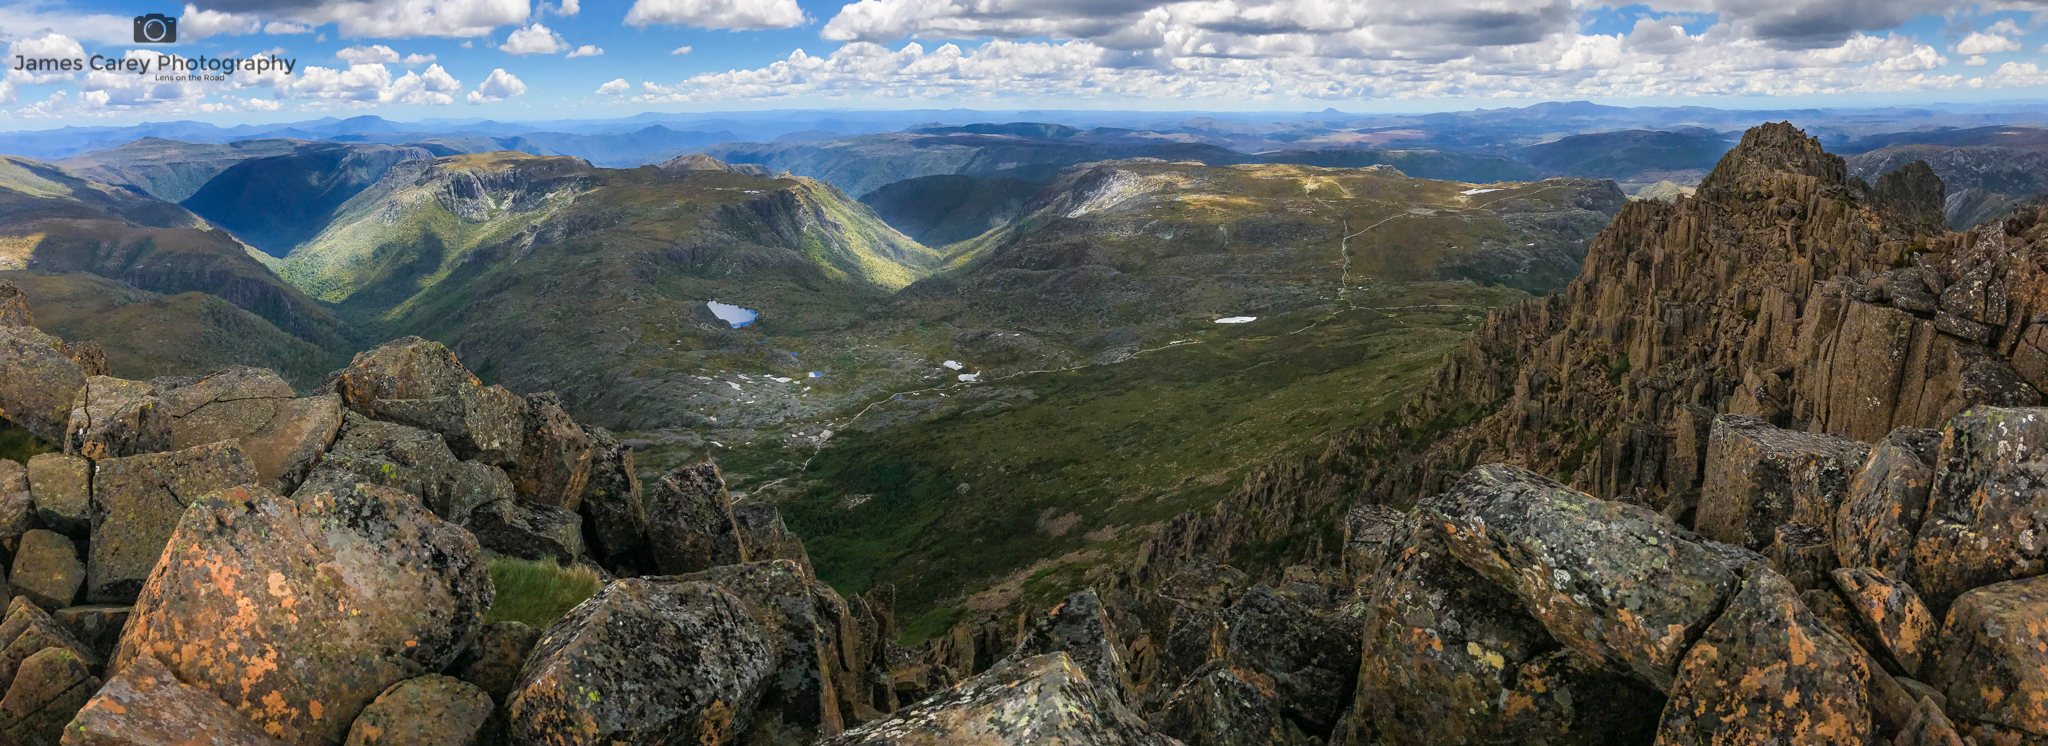 LONR - Tasmania-2.jpg